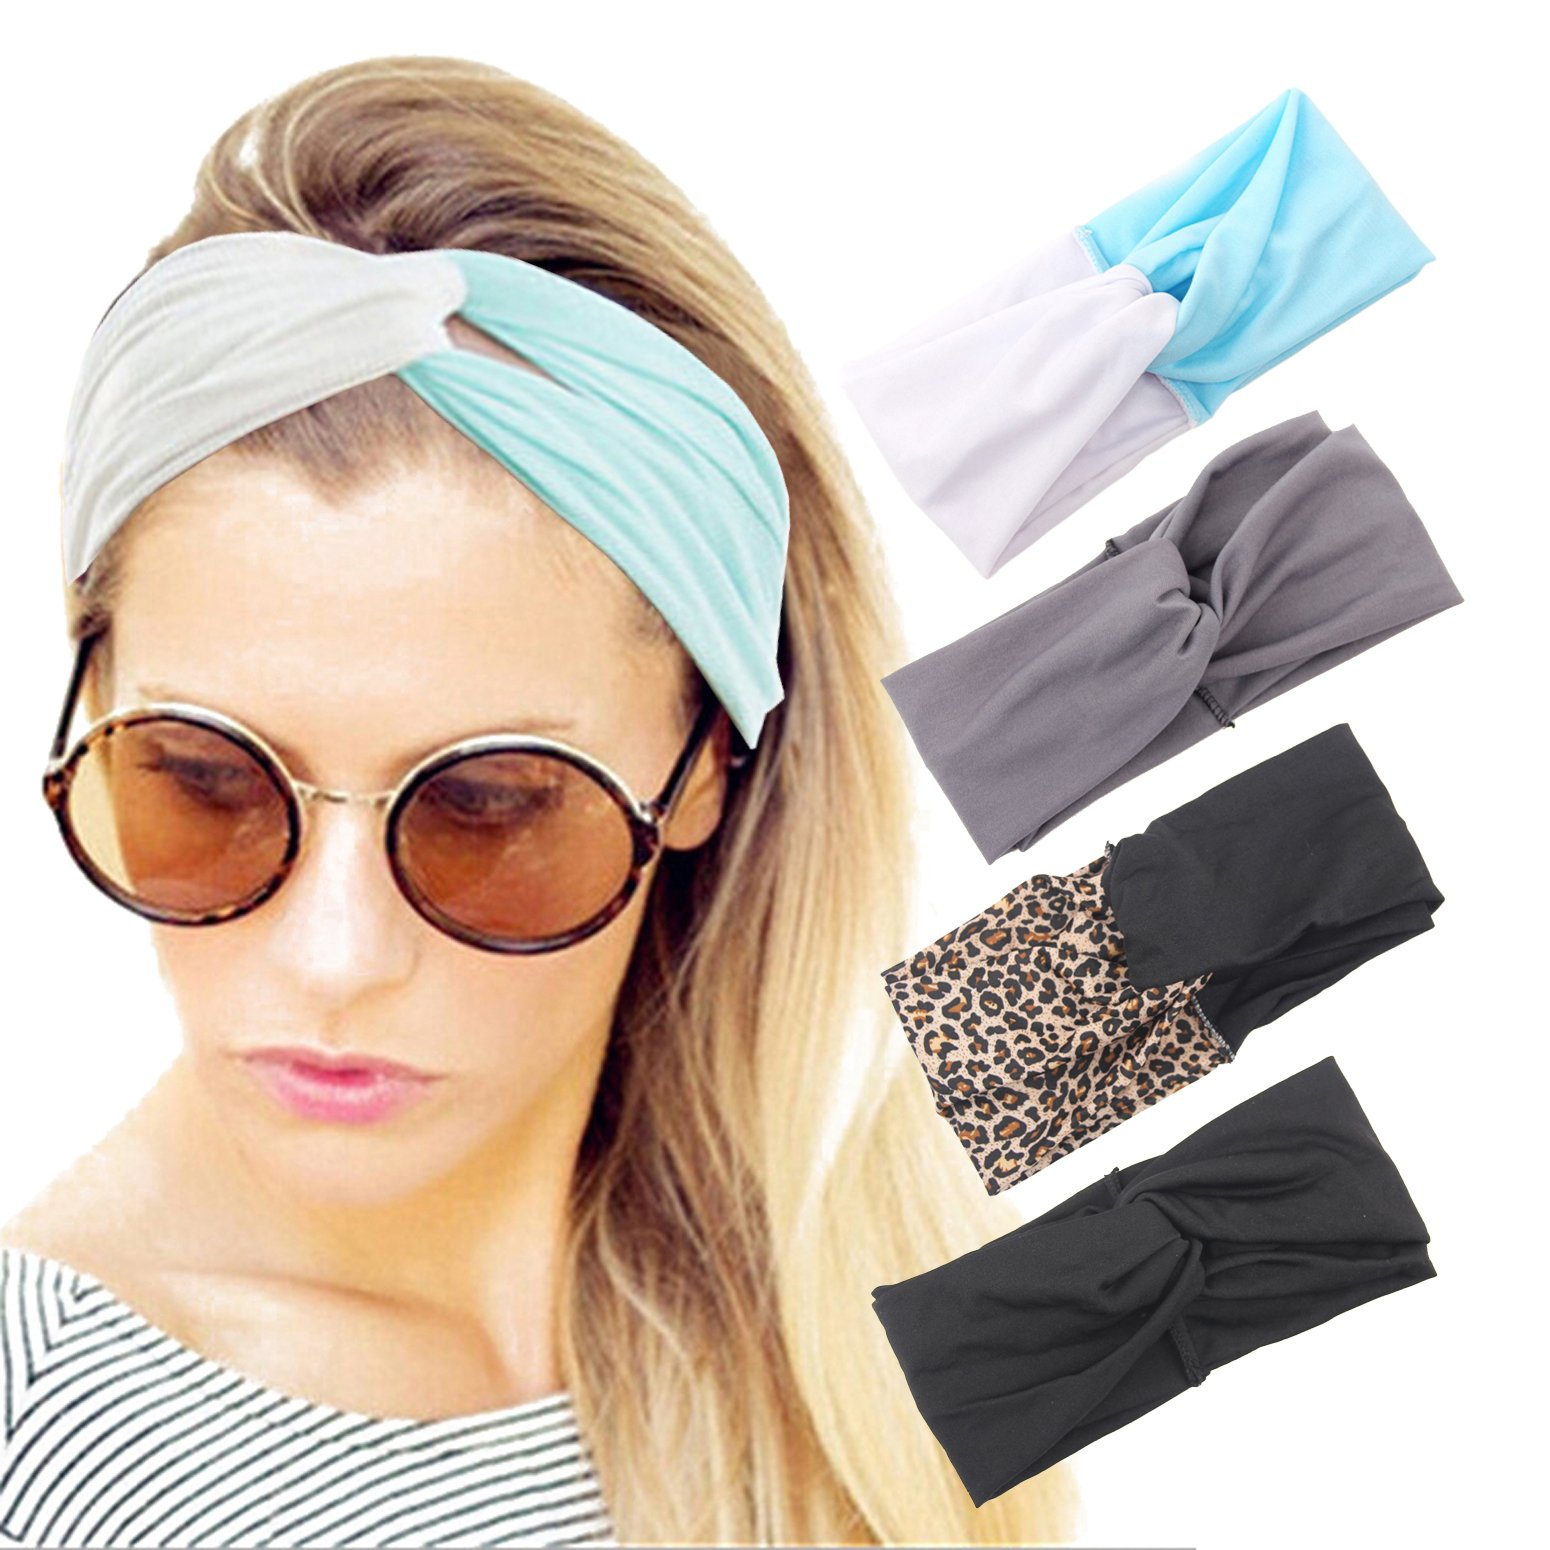 Headband Boho Floal Style Criss Cross Head Wrap Hair Band For Women Girls 4  Pack f925bd44492